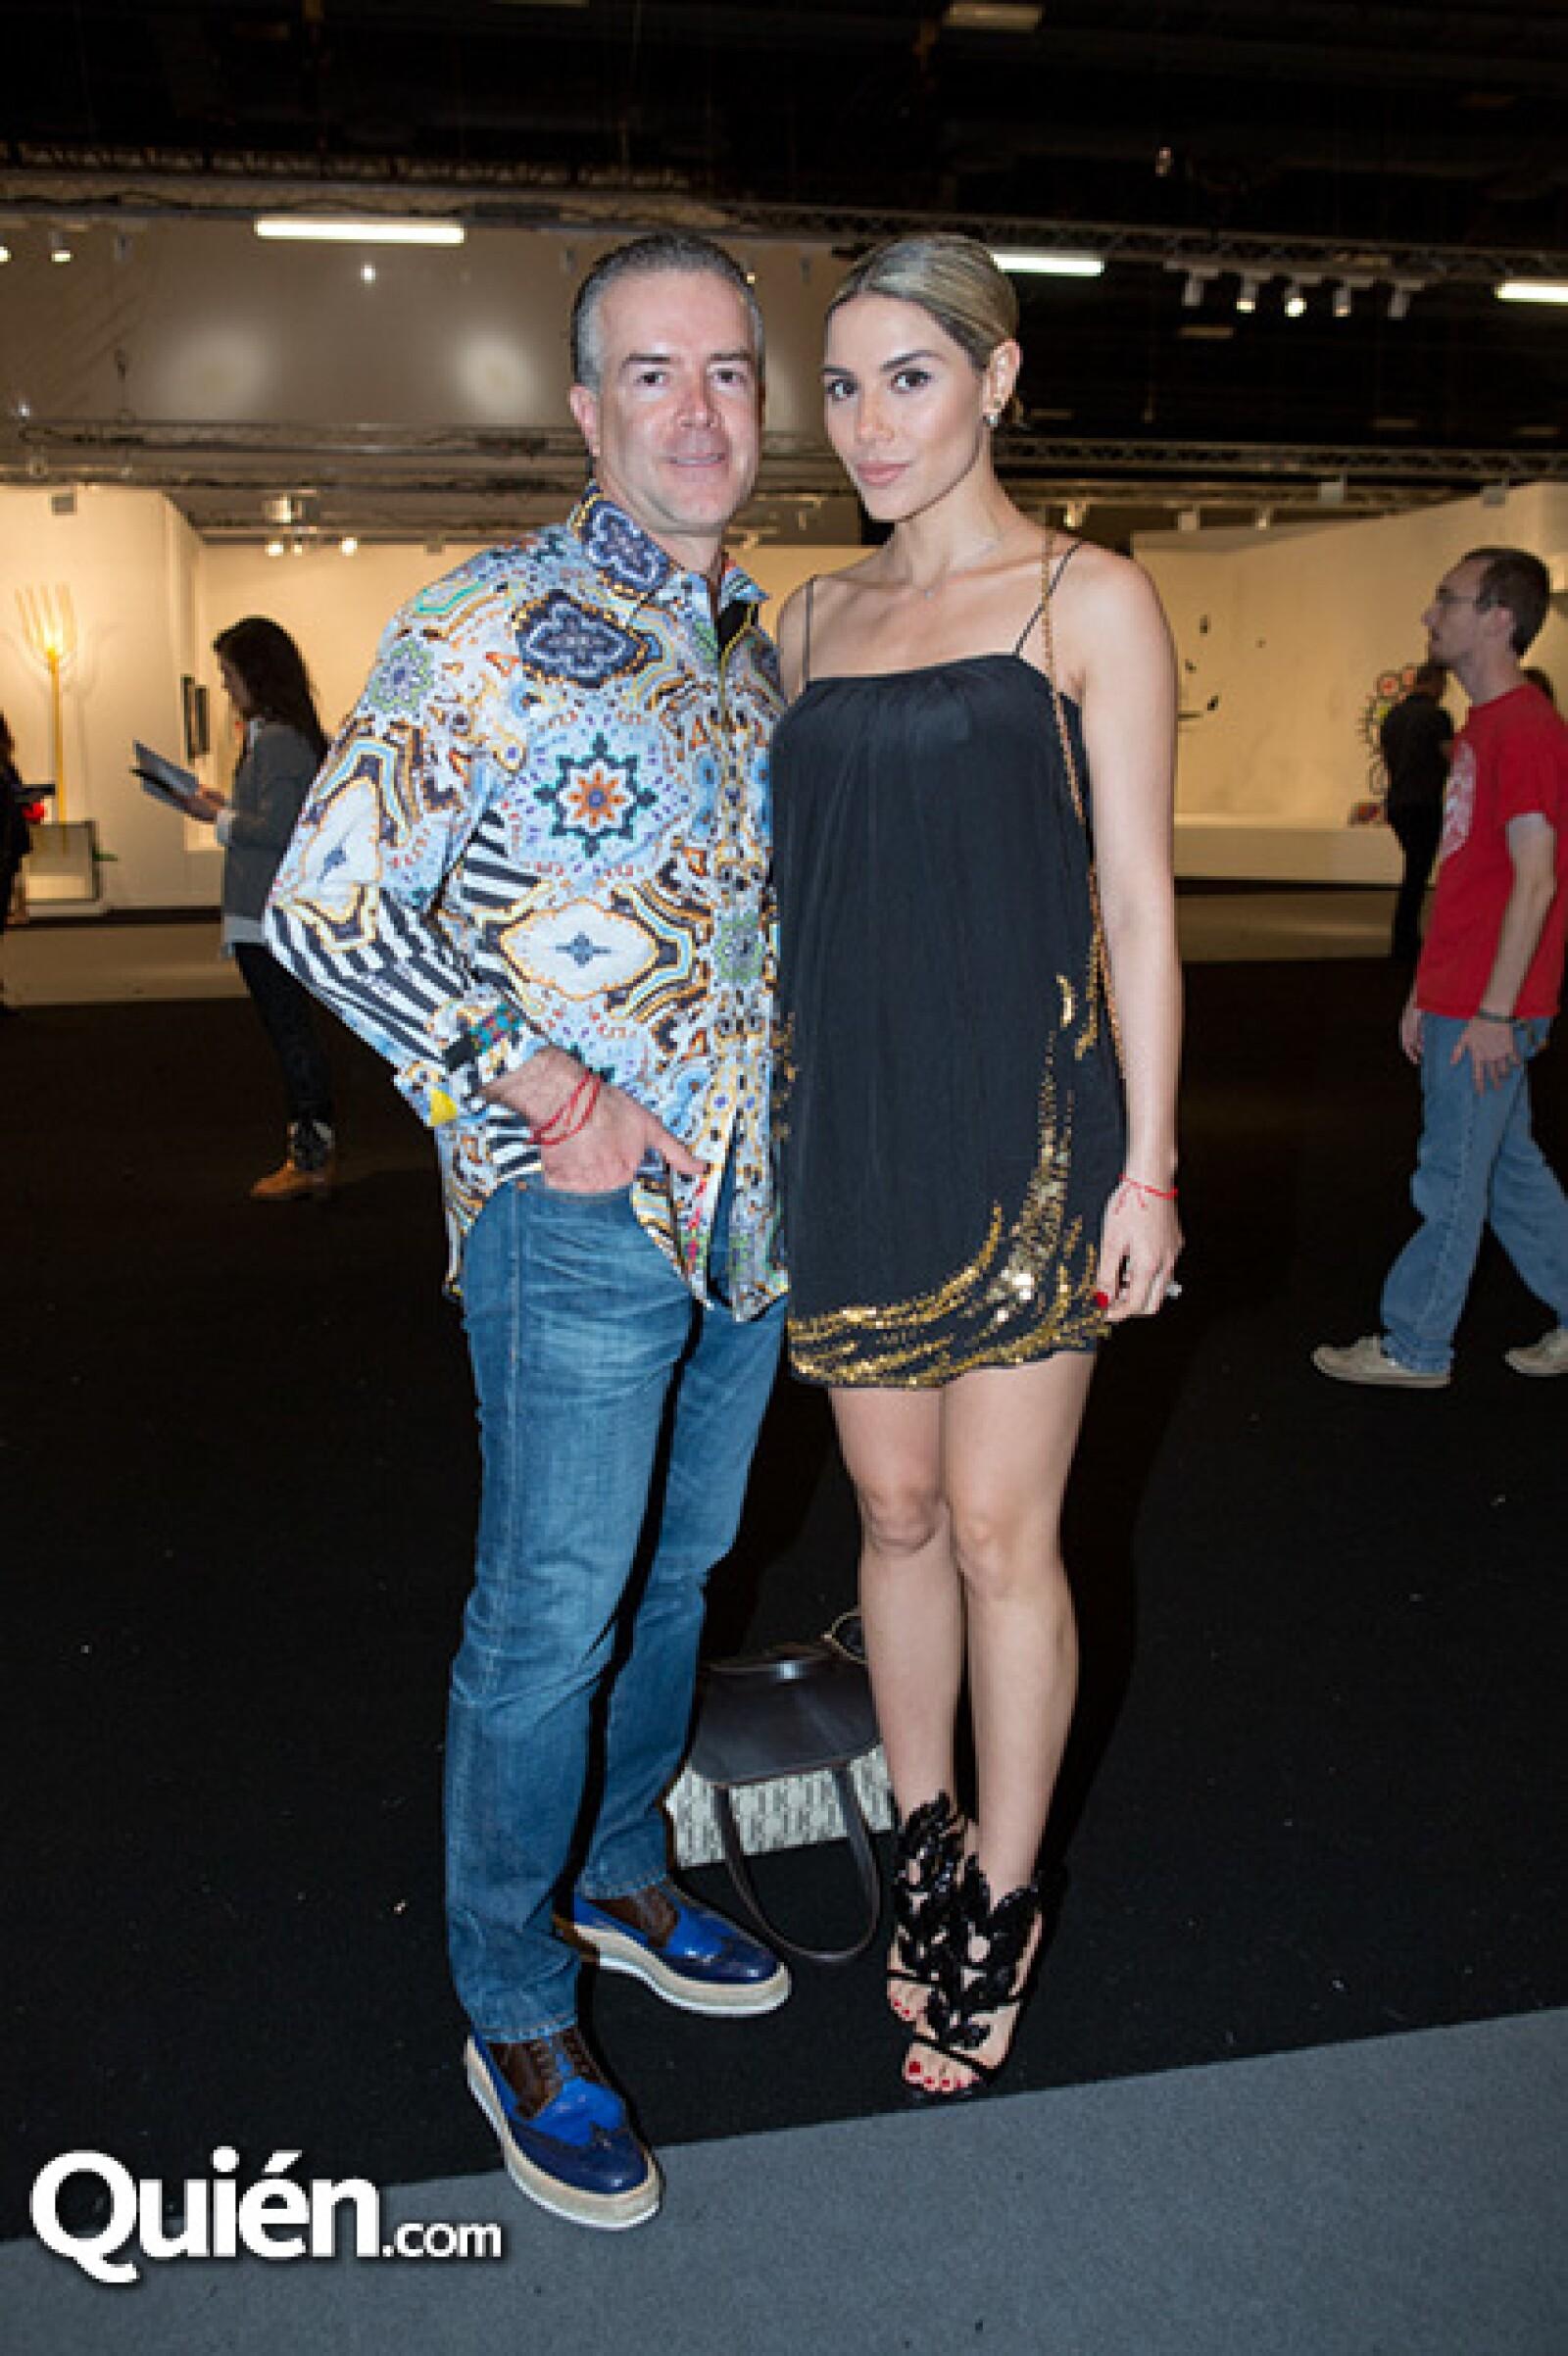 Raúl Rocha y Paulina Petterson